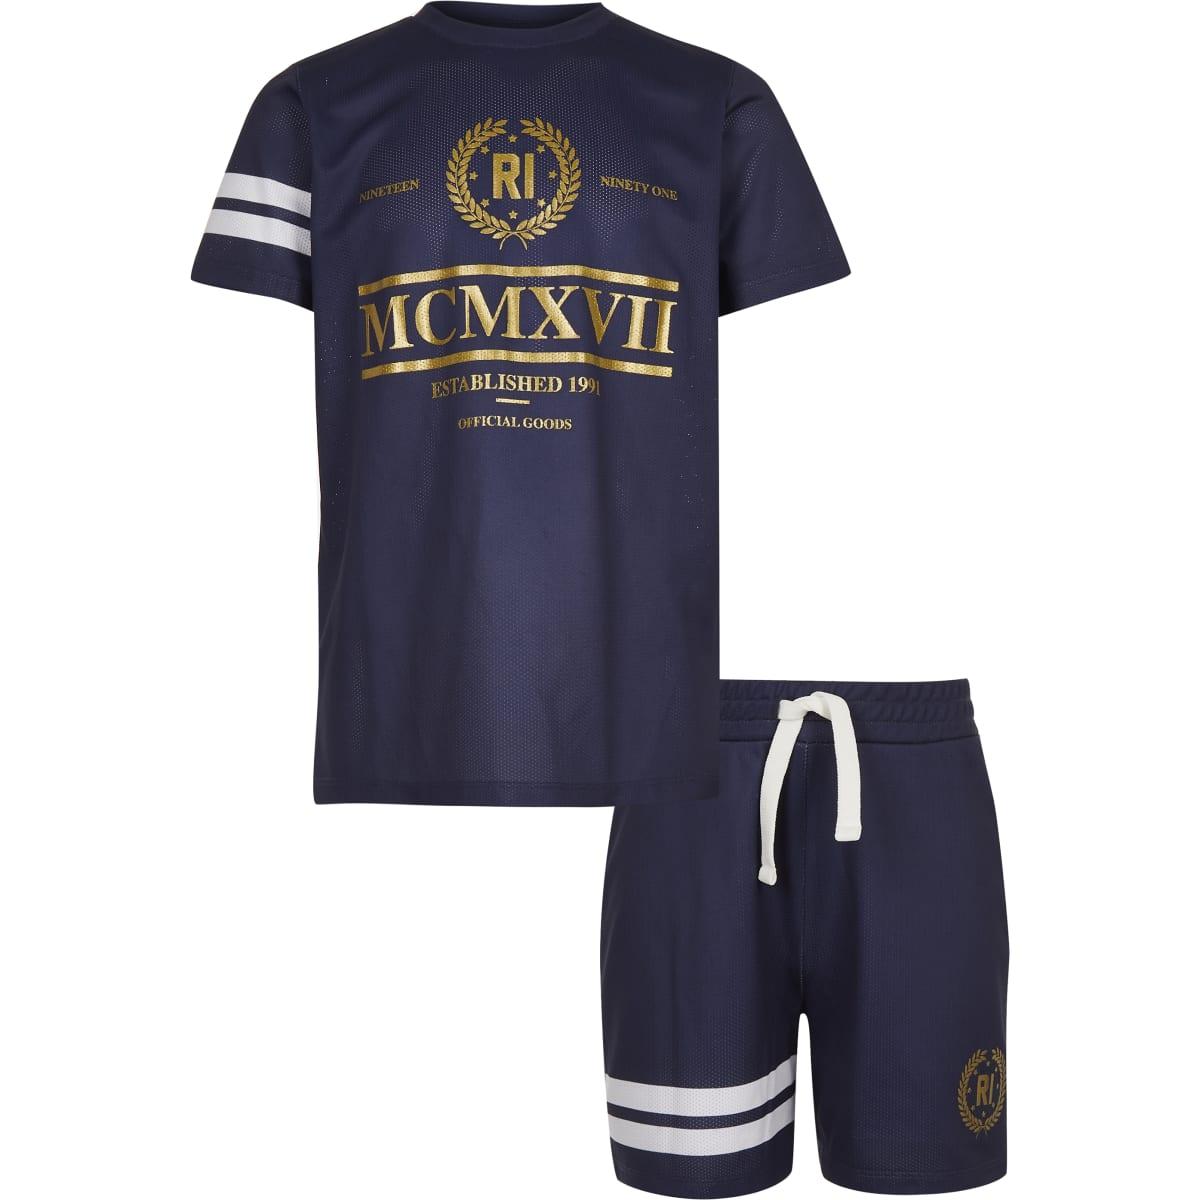 Boys navy foil print mesh T-shirt outfit